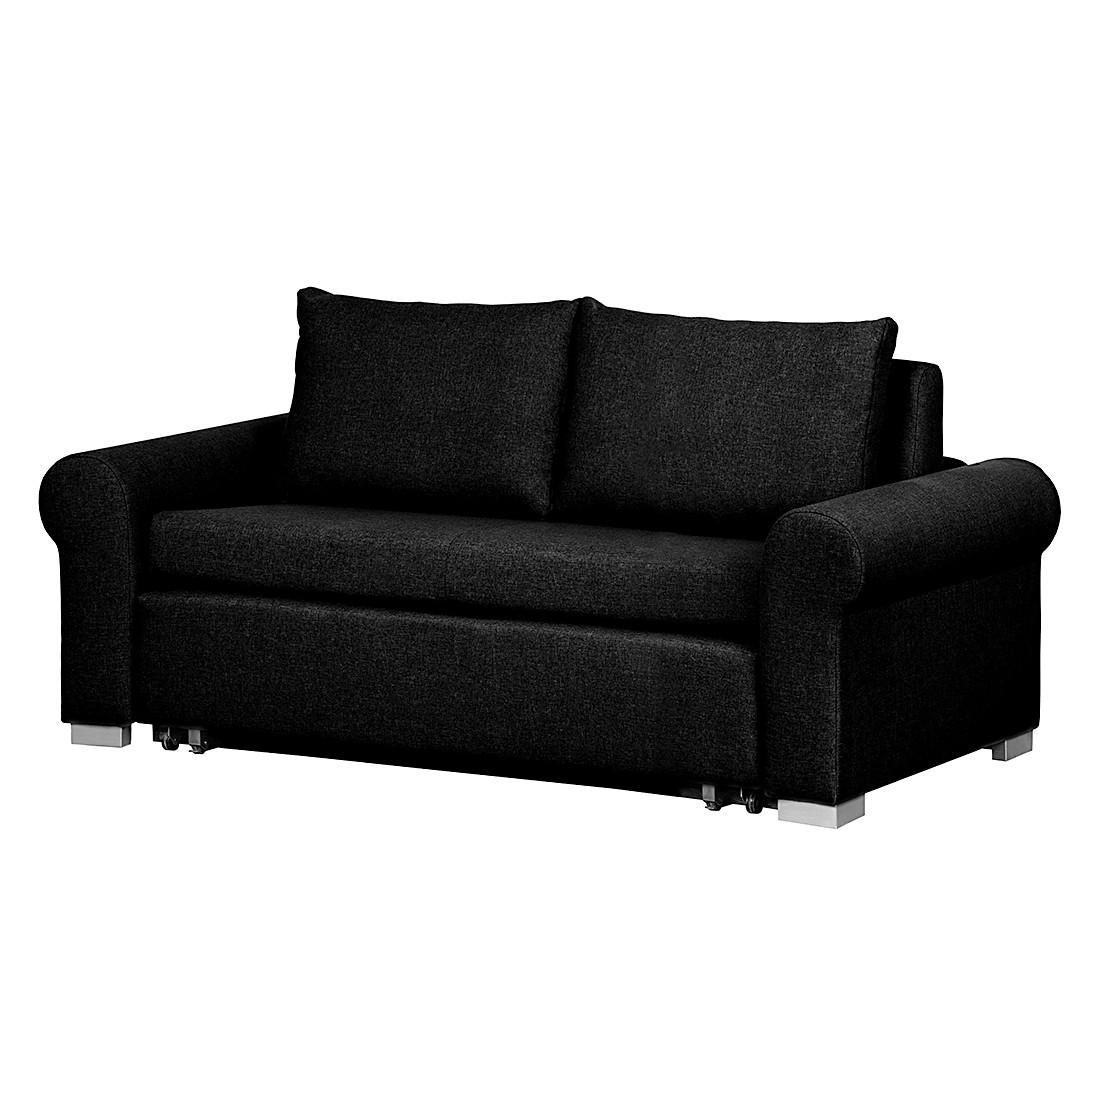 schlafsofa latina country i webstoff schwarz 205 cm roomscape. Black Bedroom Furniture Sets. Home Design Ideas